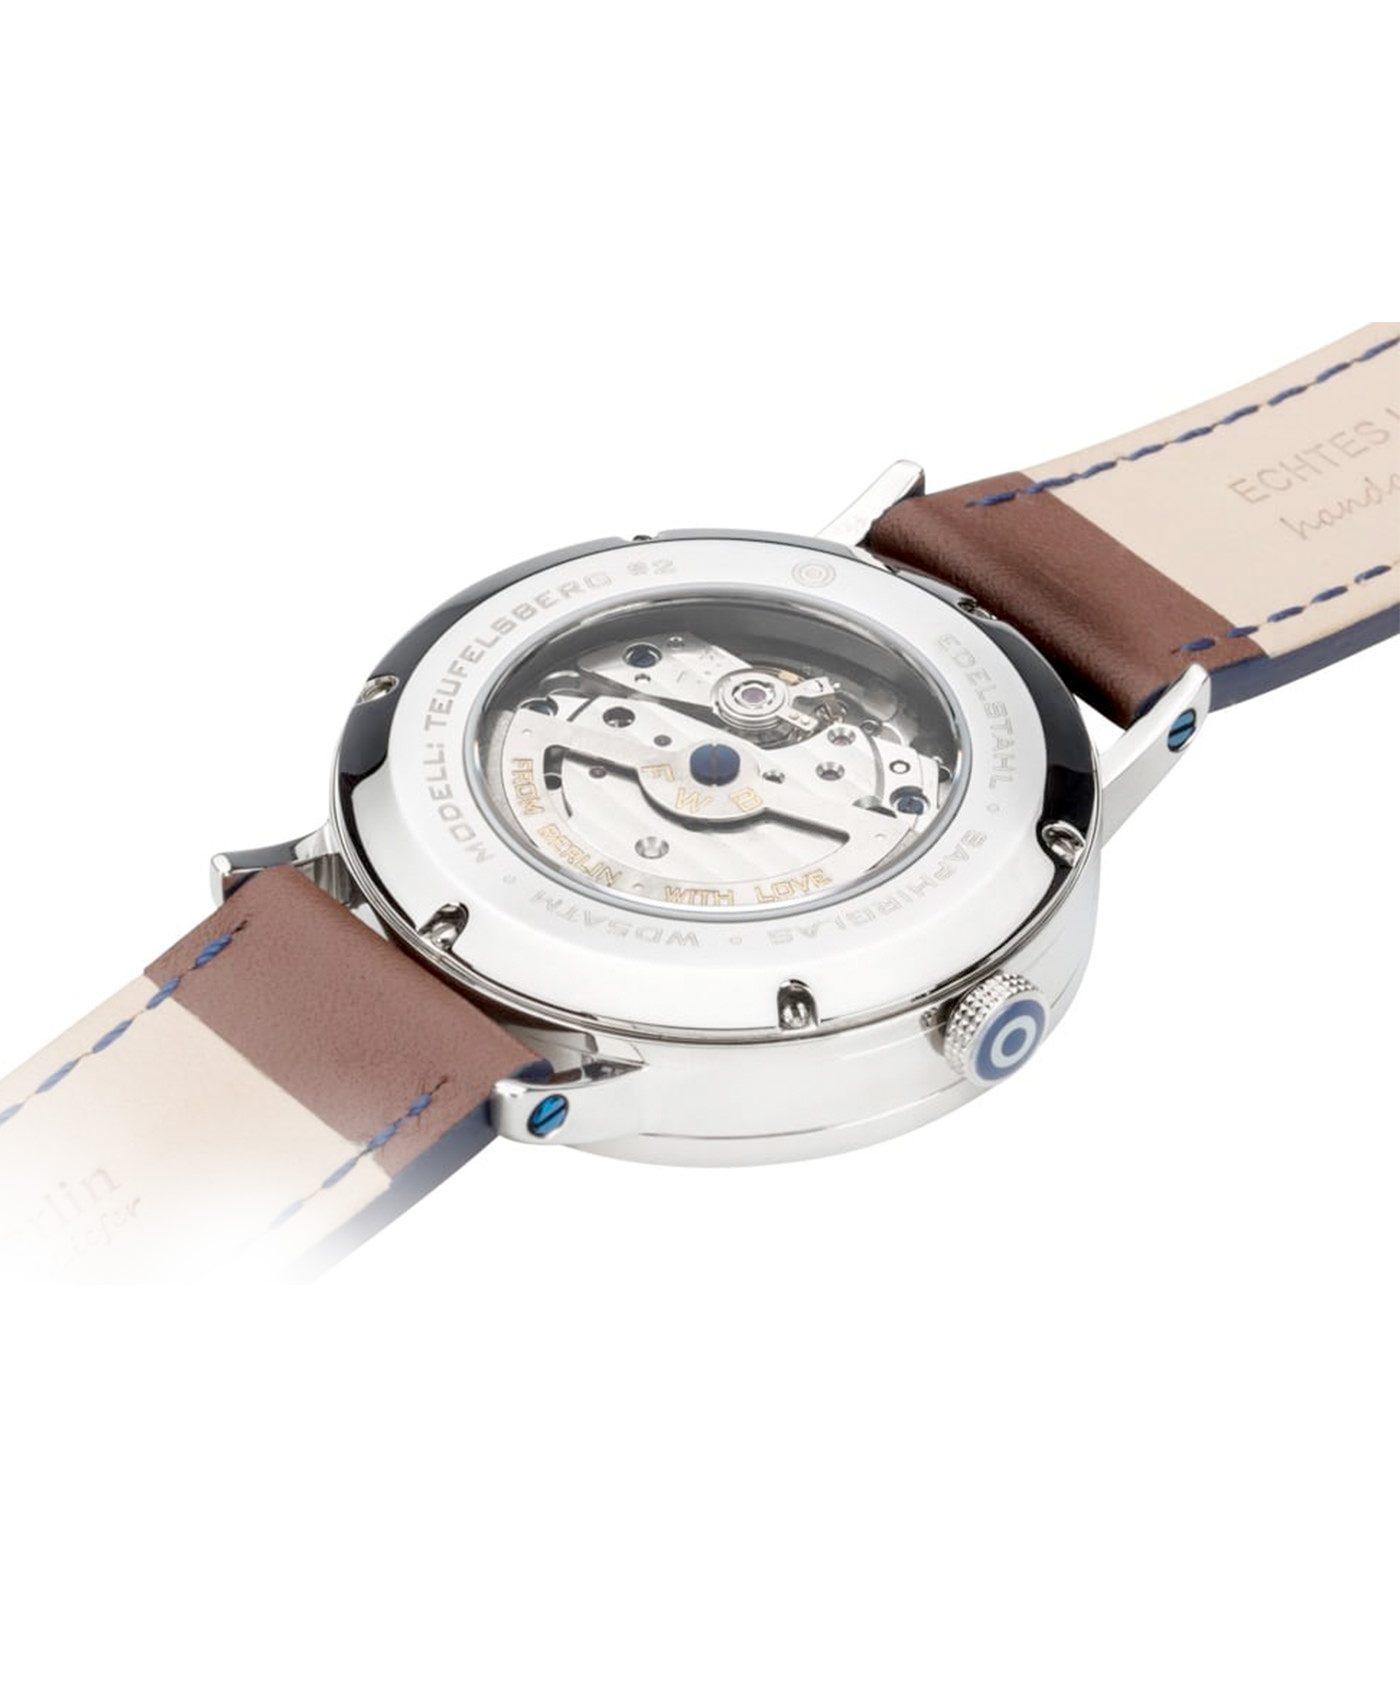 WB Watch fine watches berlin TEUFELSBERG white back